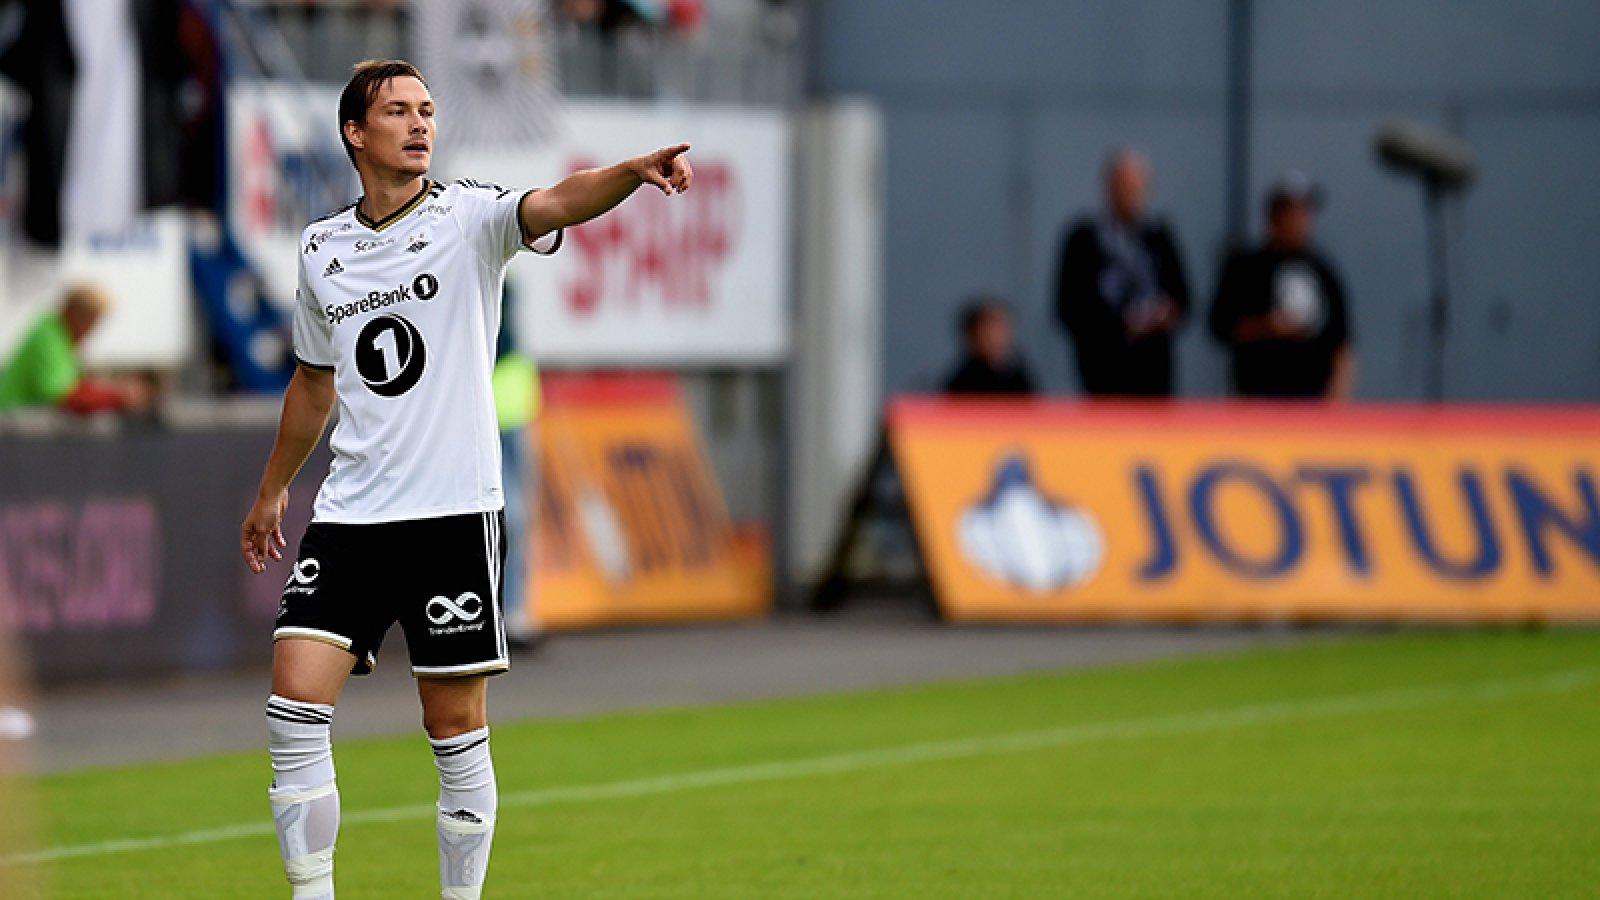 Lædre Bjørdal debut mot Sandefjord 26.07.2015